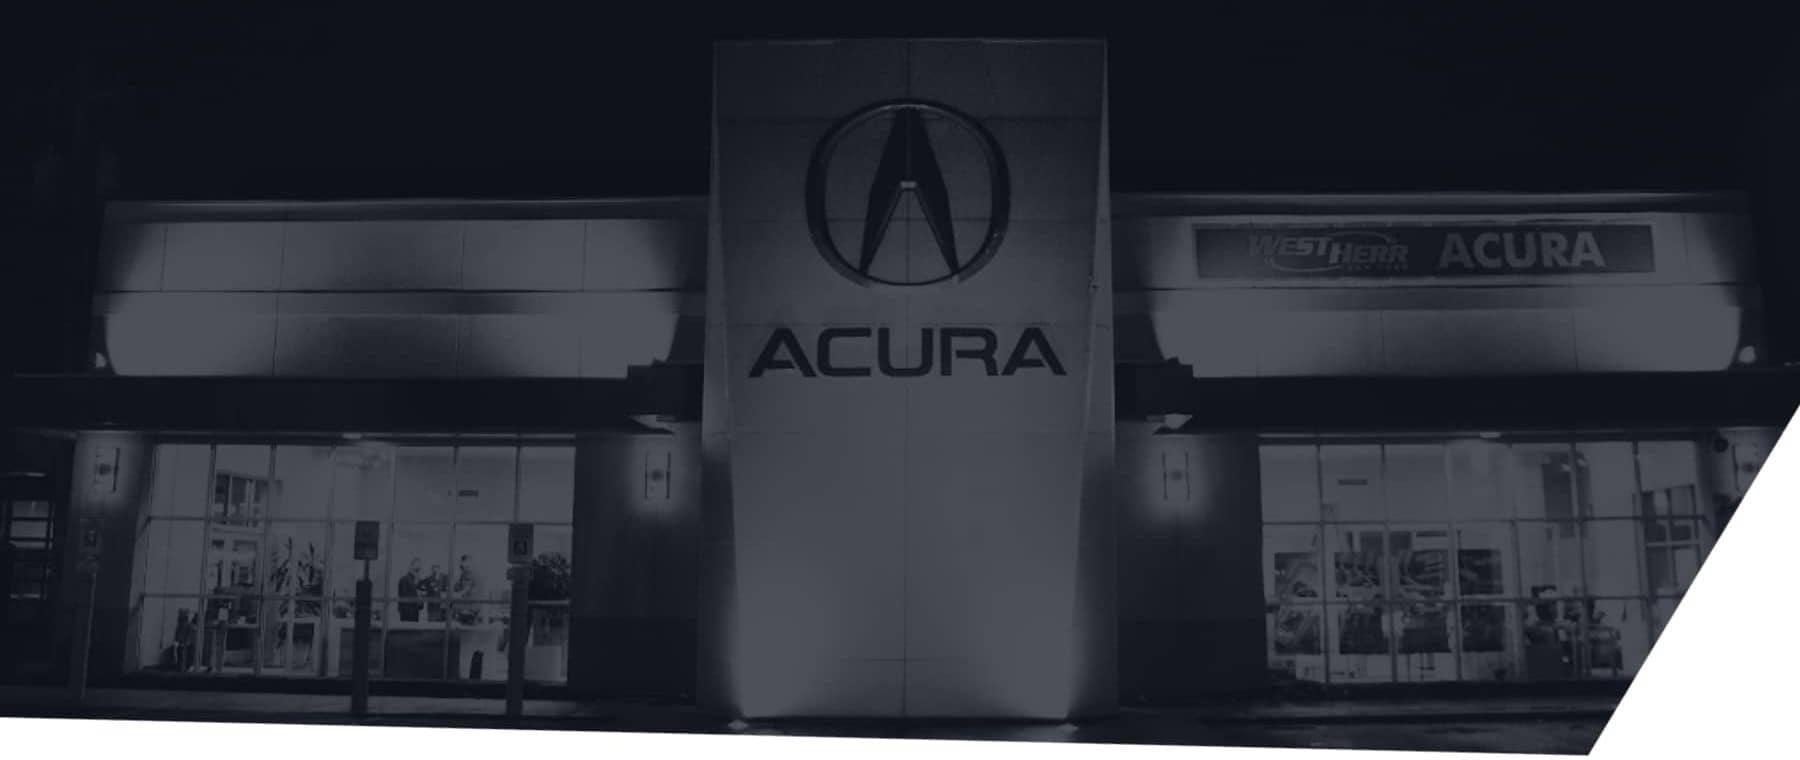 West Herr Acura dealership building exterior